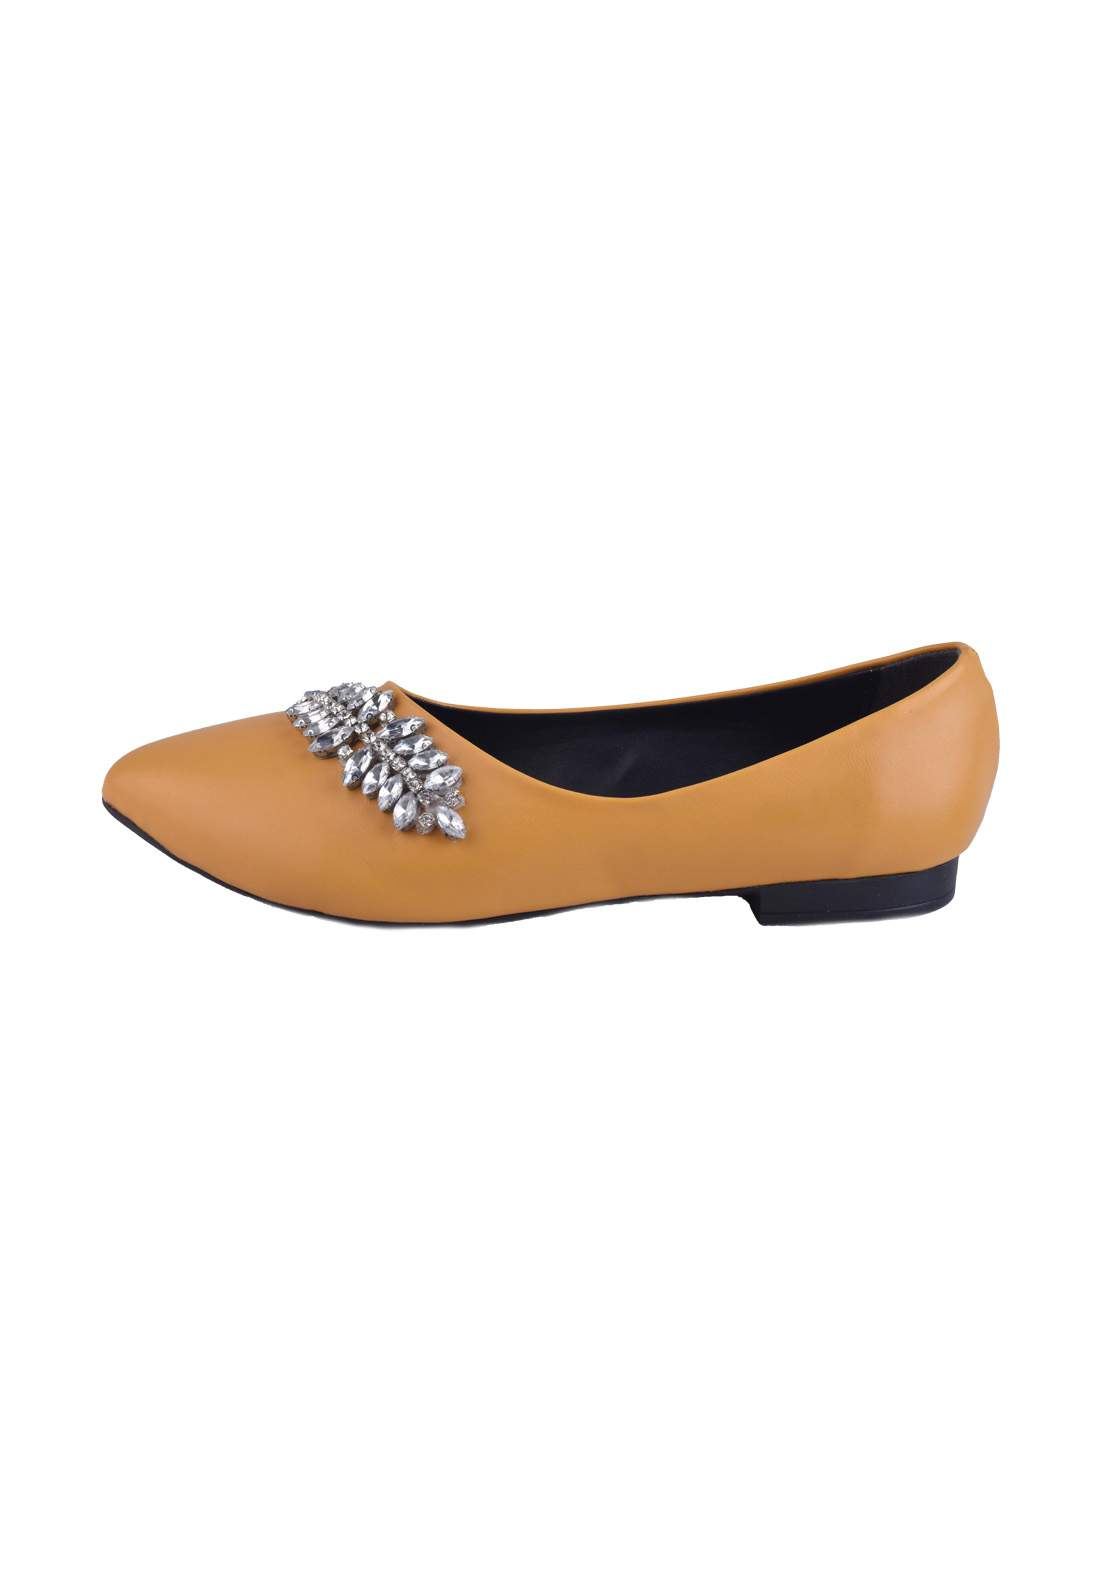 حذاء نسائي  اصفر اللون